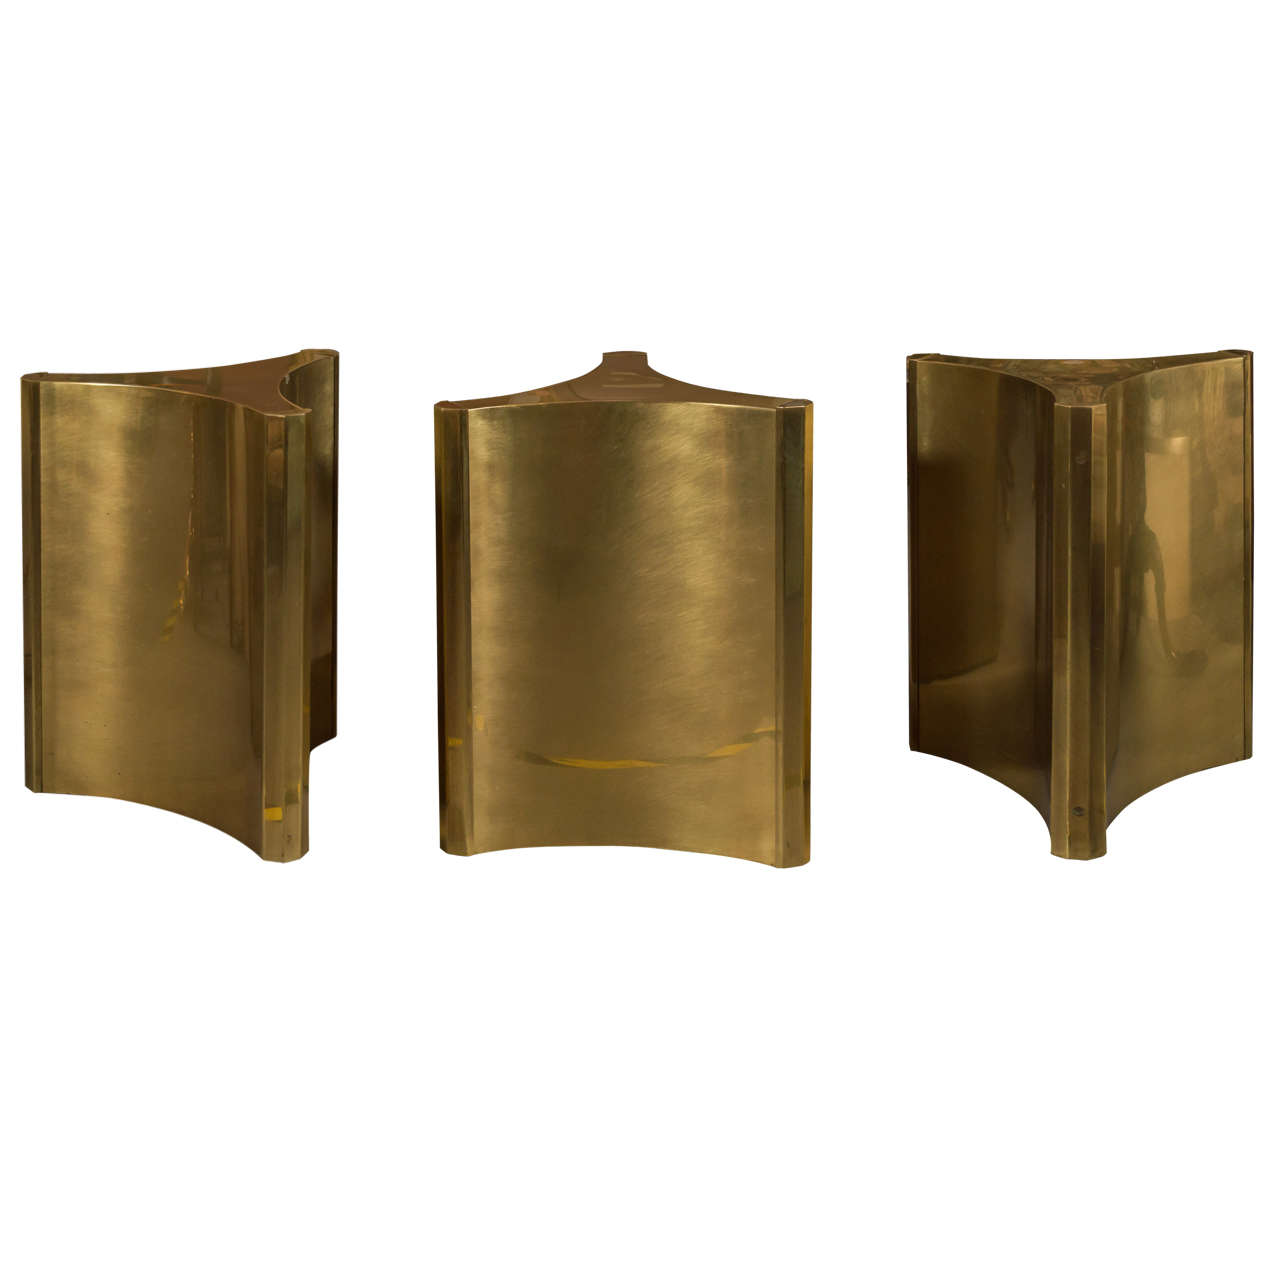 Mastercraft brass dining table - 3 Mastercraft Brass Dining Table Pedestals Sale 1